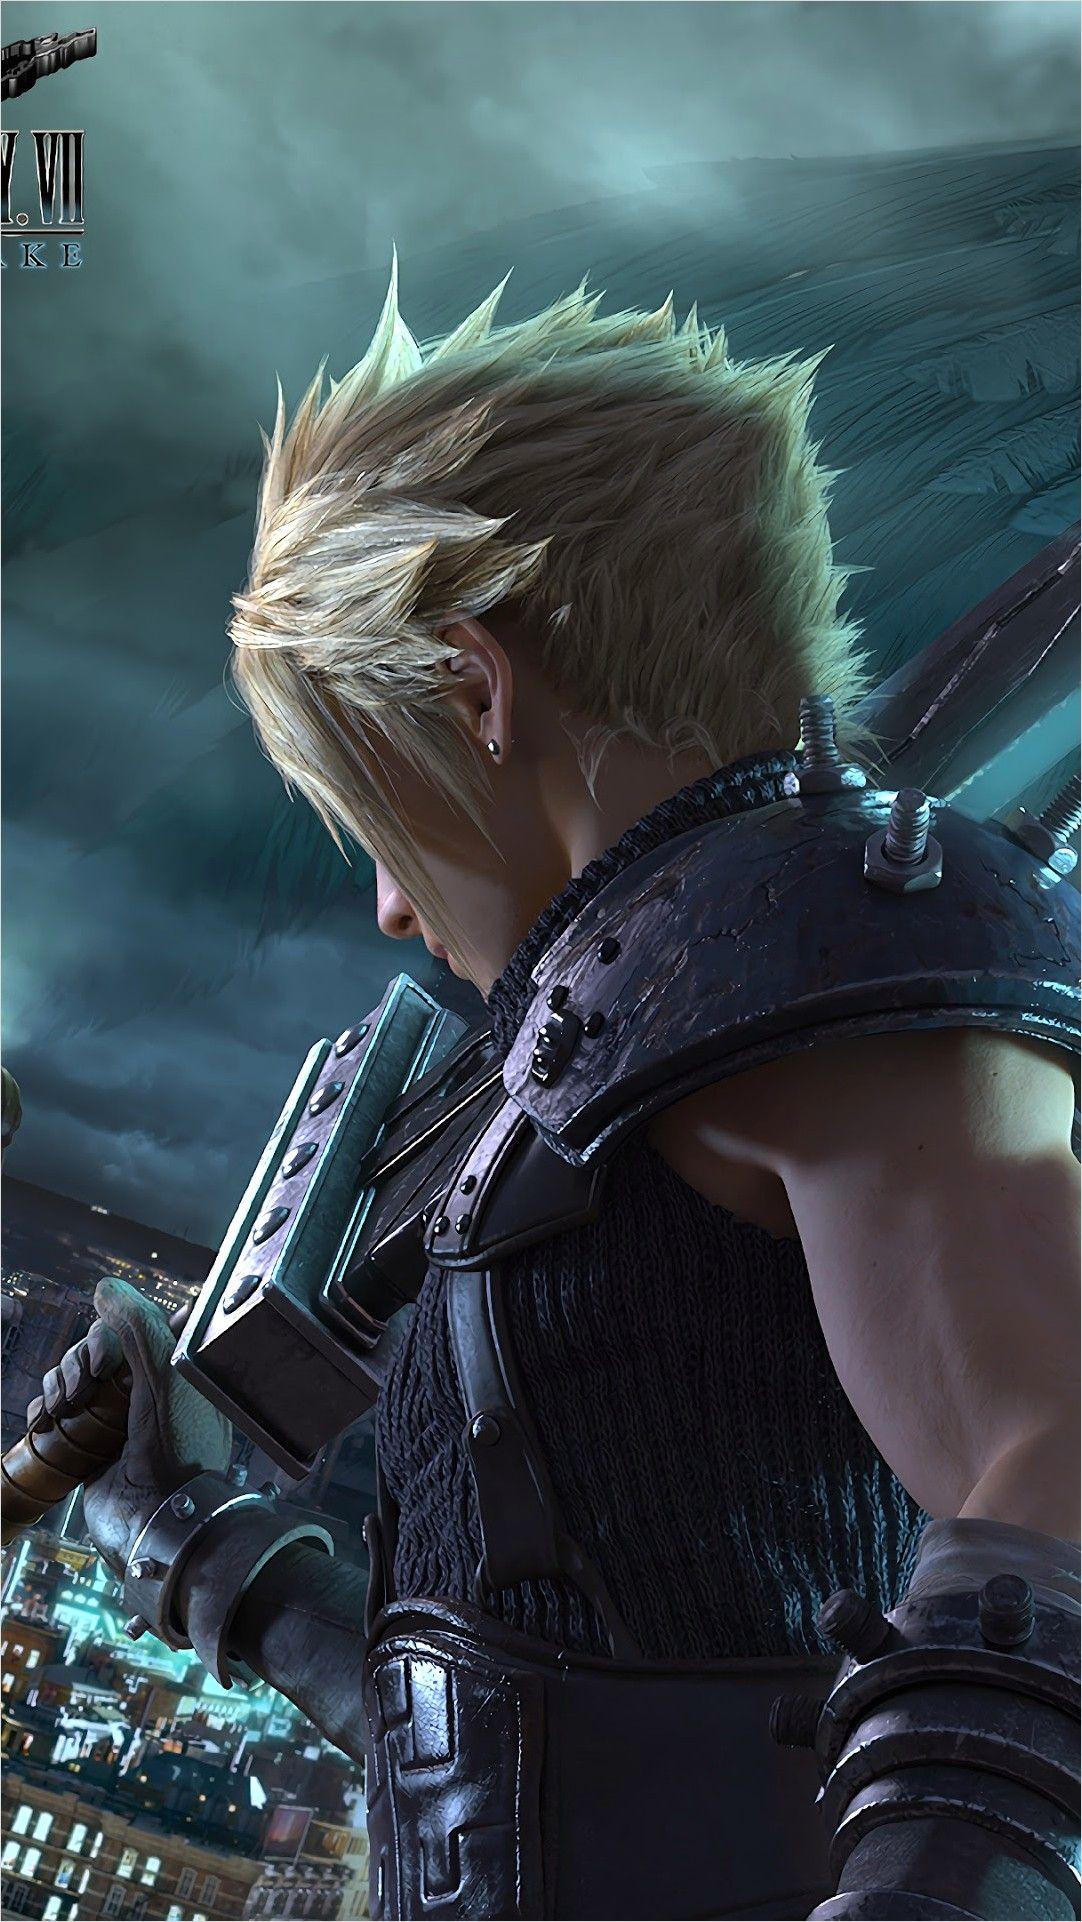 4k Final Fantasy 7 Wallpaper In 2020 Final Fantasy Cloud Final Fantasy Vii Cloud Noctis Final Fantasy